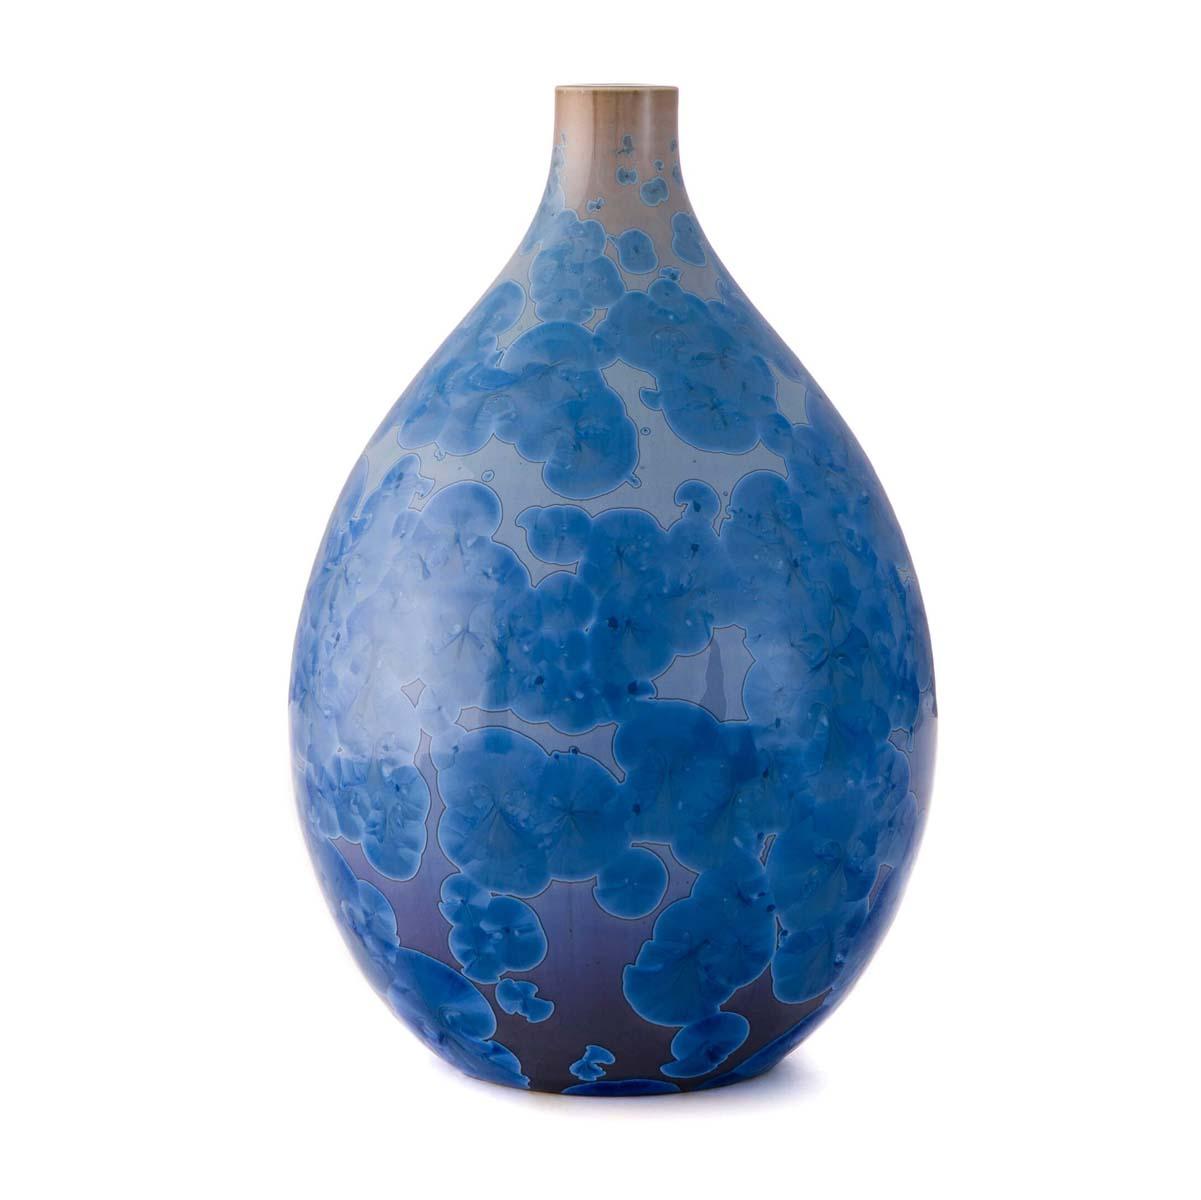 Simon Pearce Crystalline Teardrop Vase M